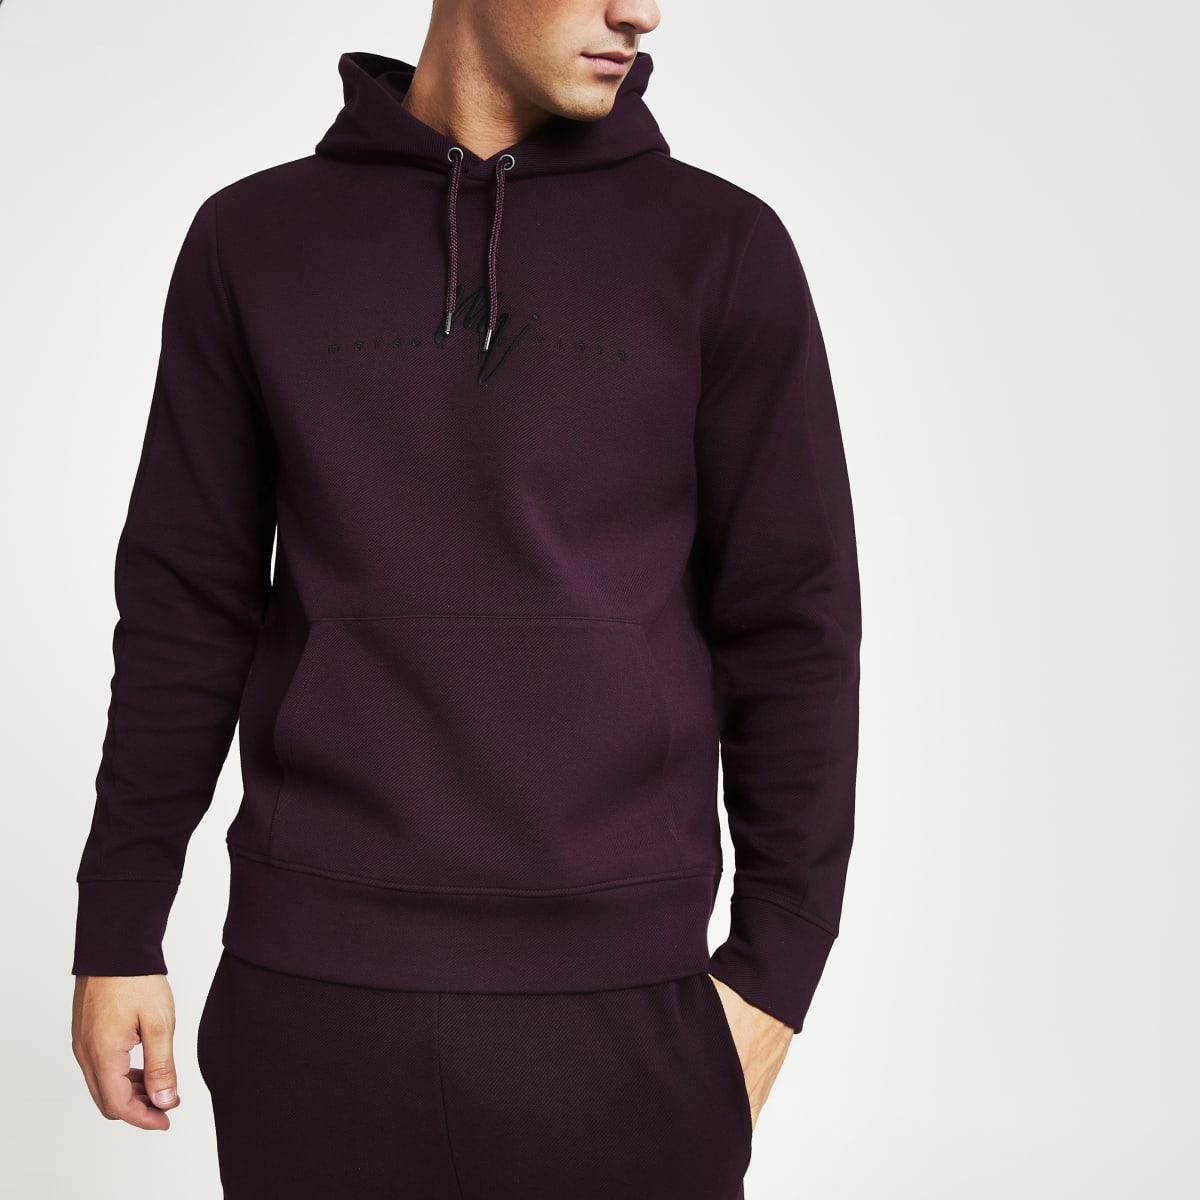 Maison Riviera - Donkerrode slim-fit hoodie met keperbinding